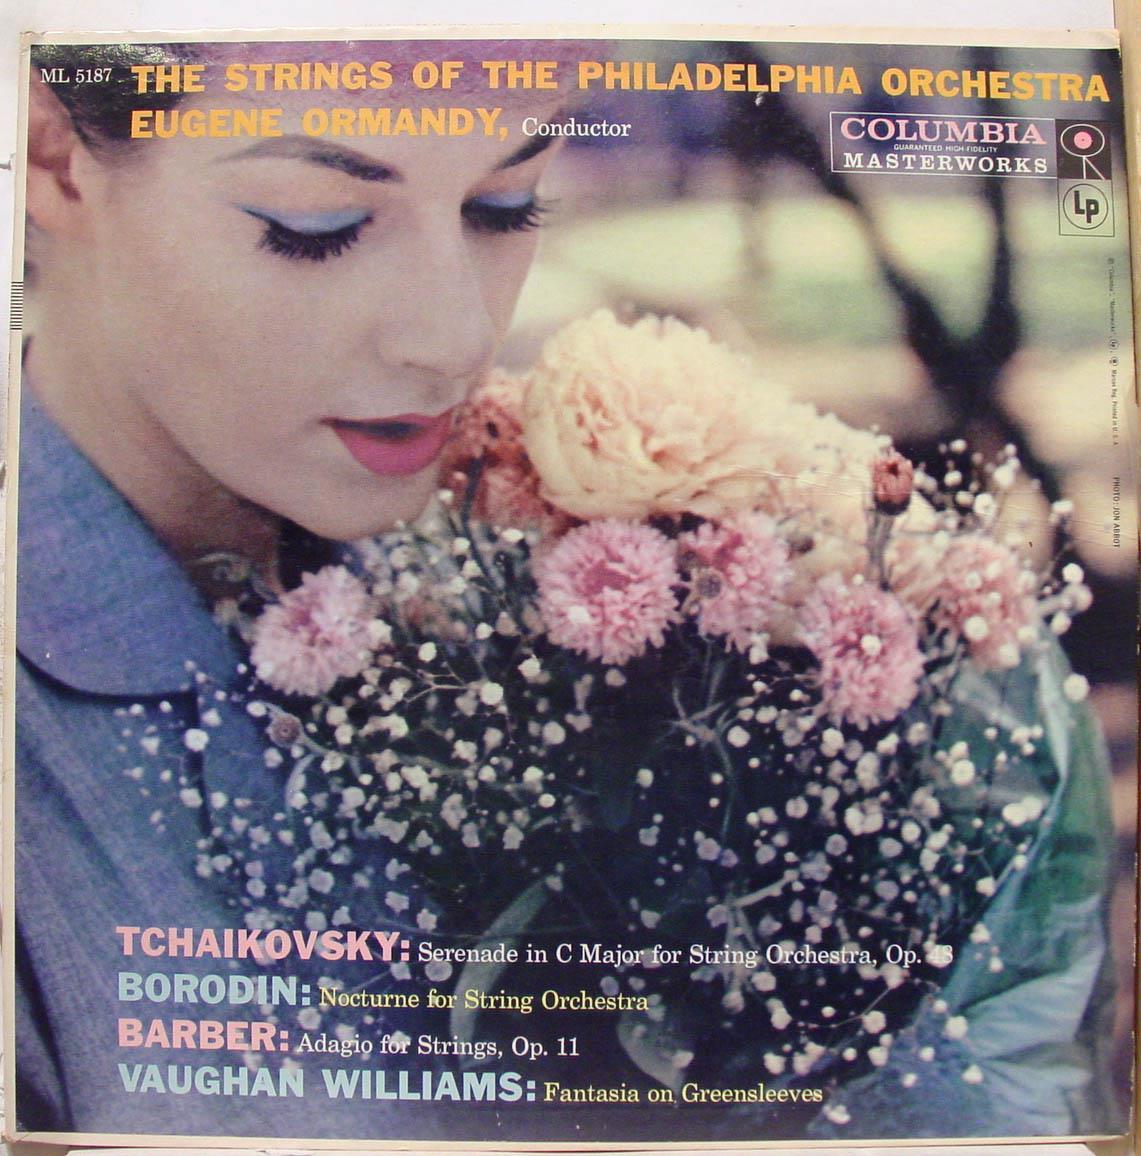 EUGENE ORMANDY - Tchaikovsky Borodin Barber Williams